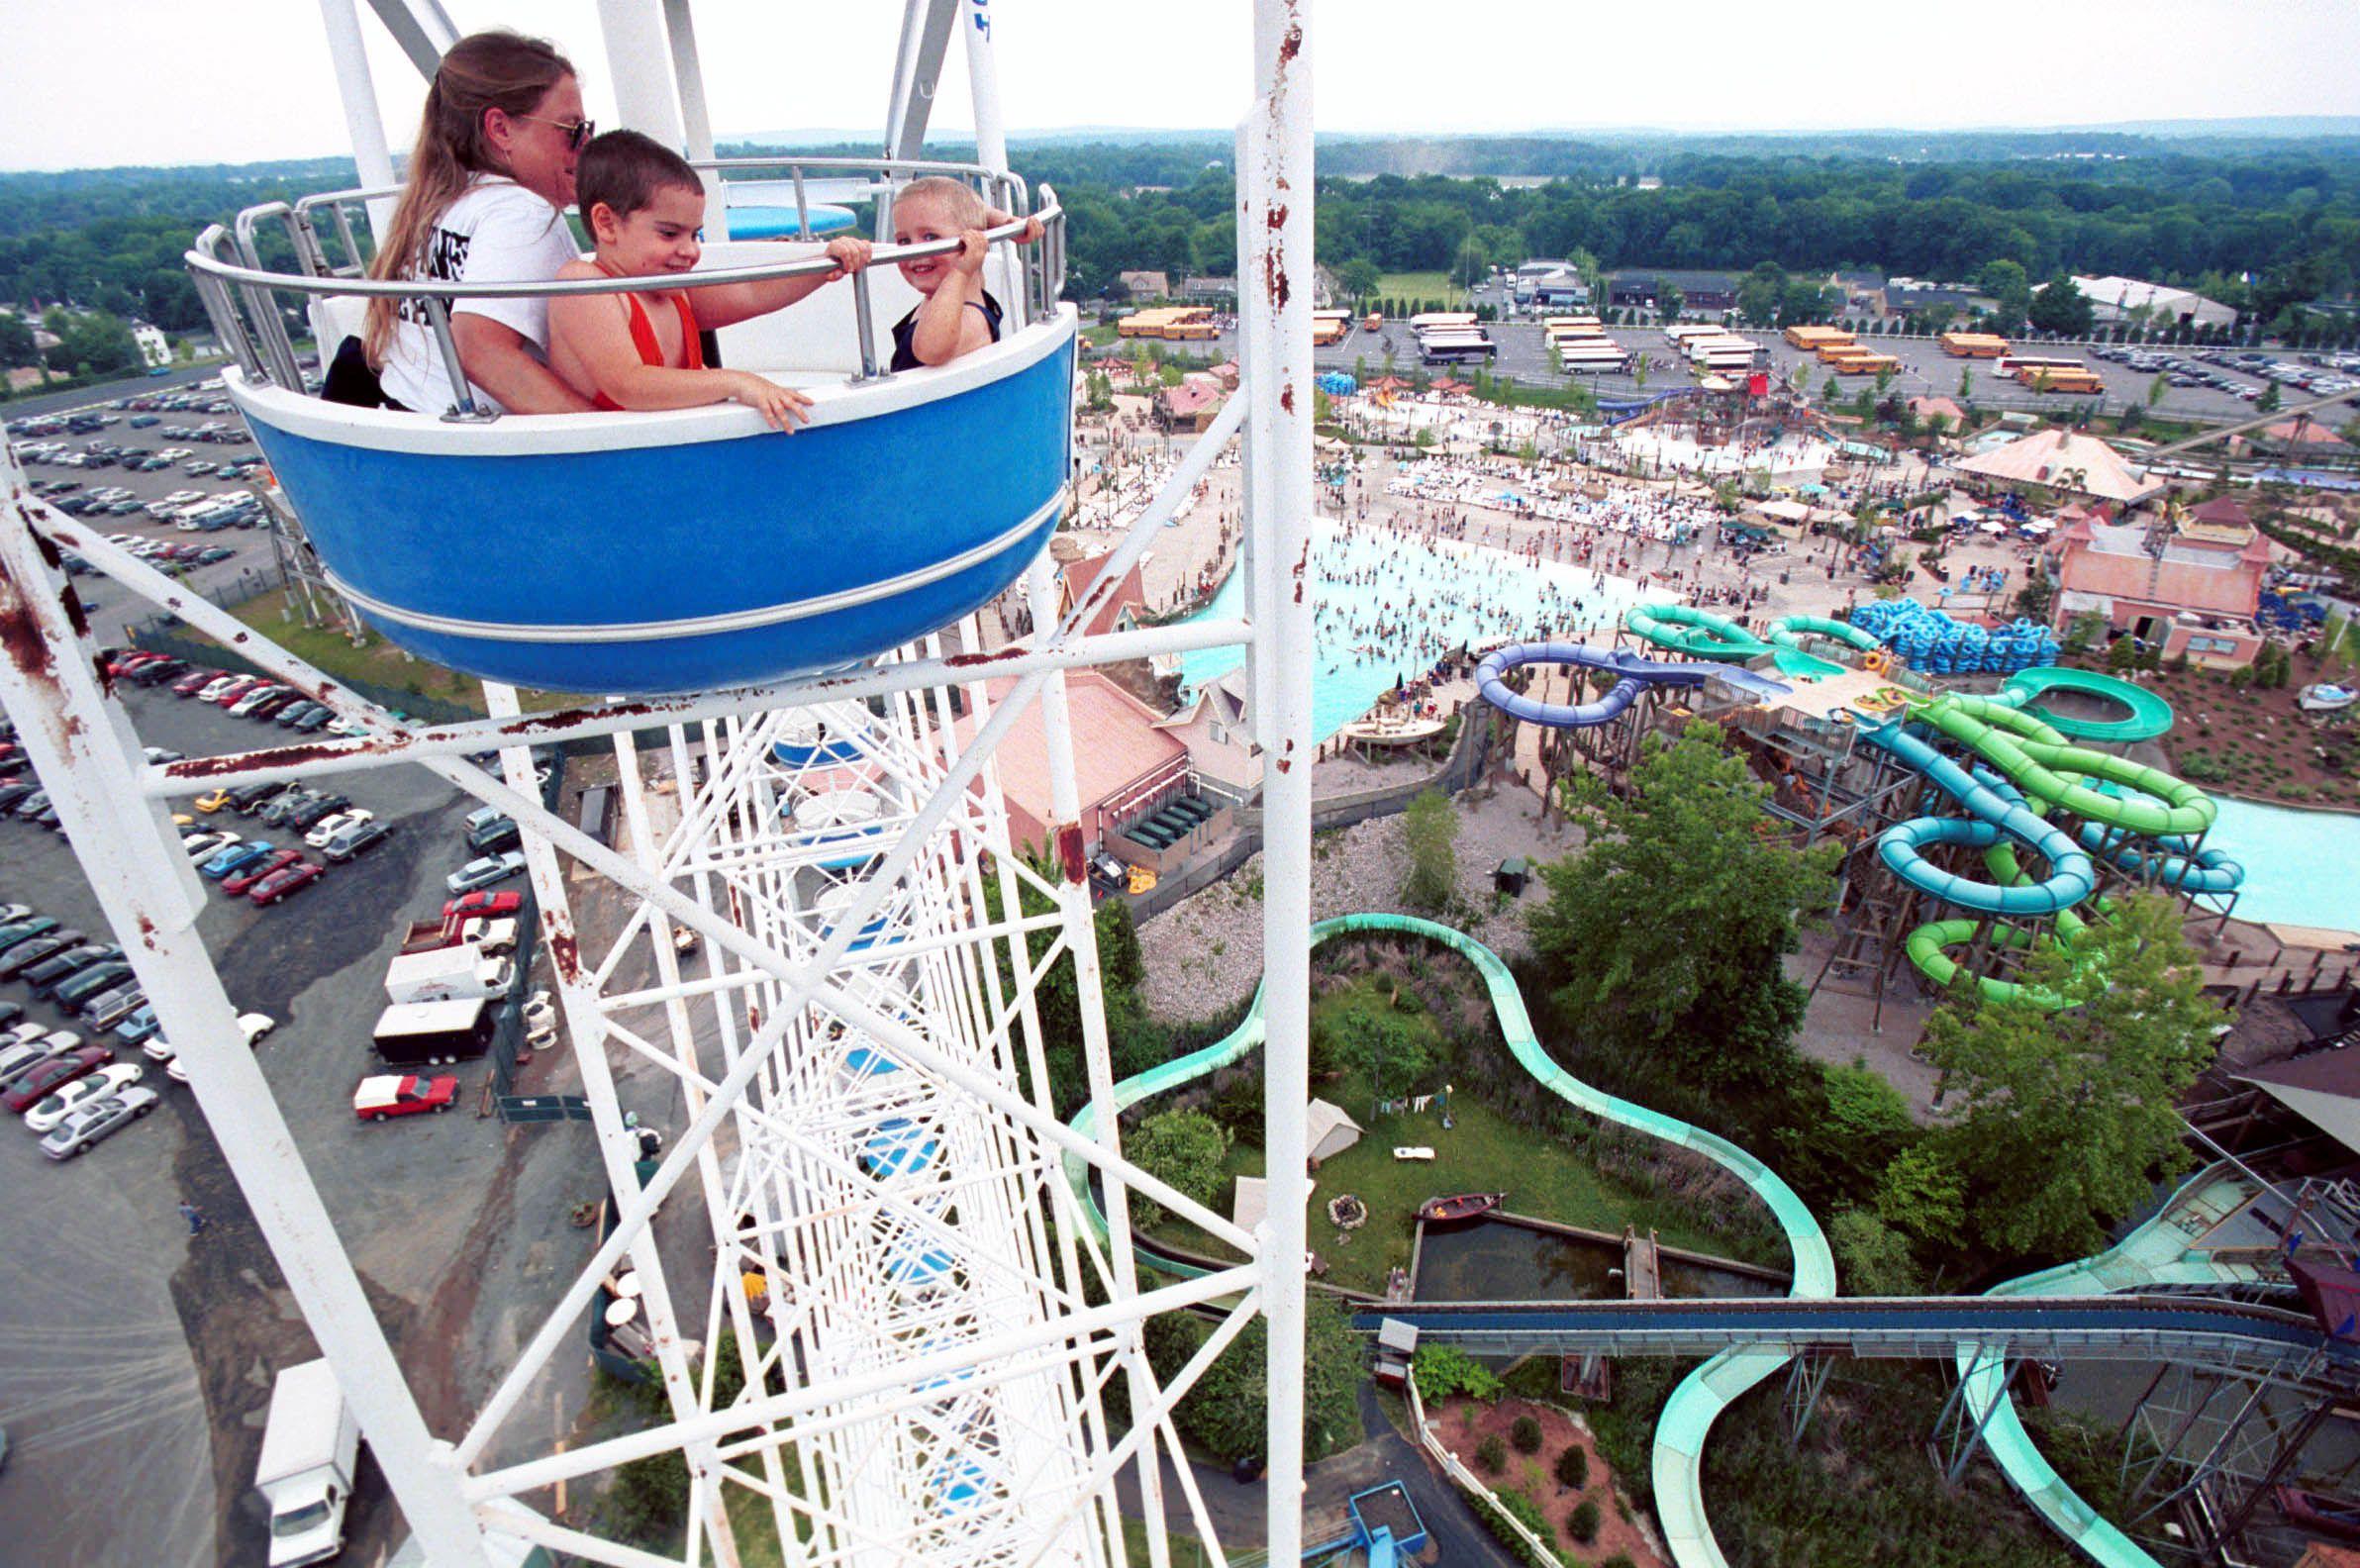 Six Flags New England in Agawam, Hurricane Harbor